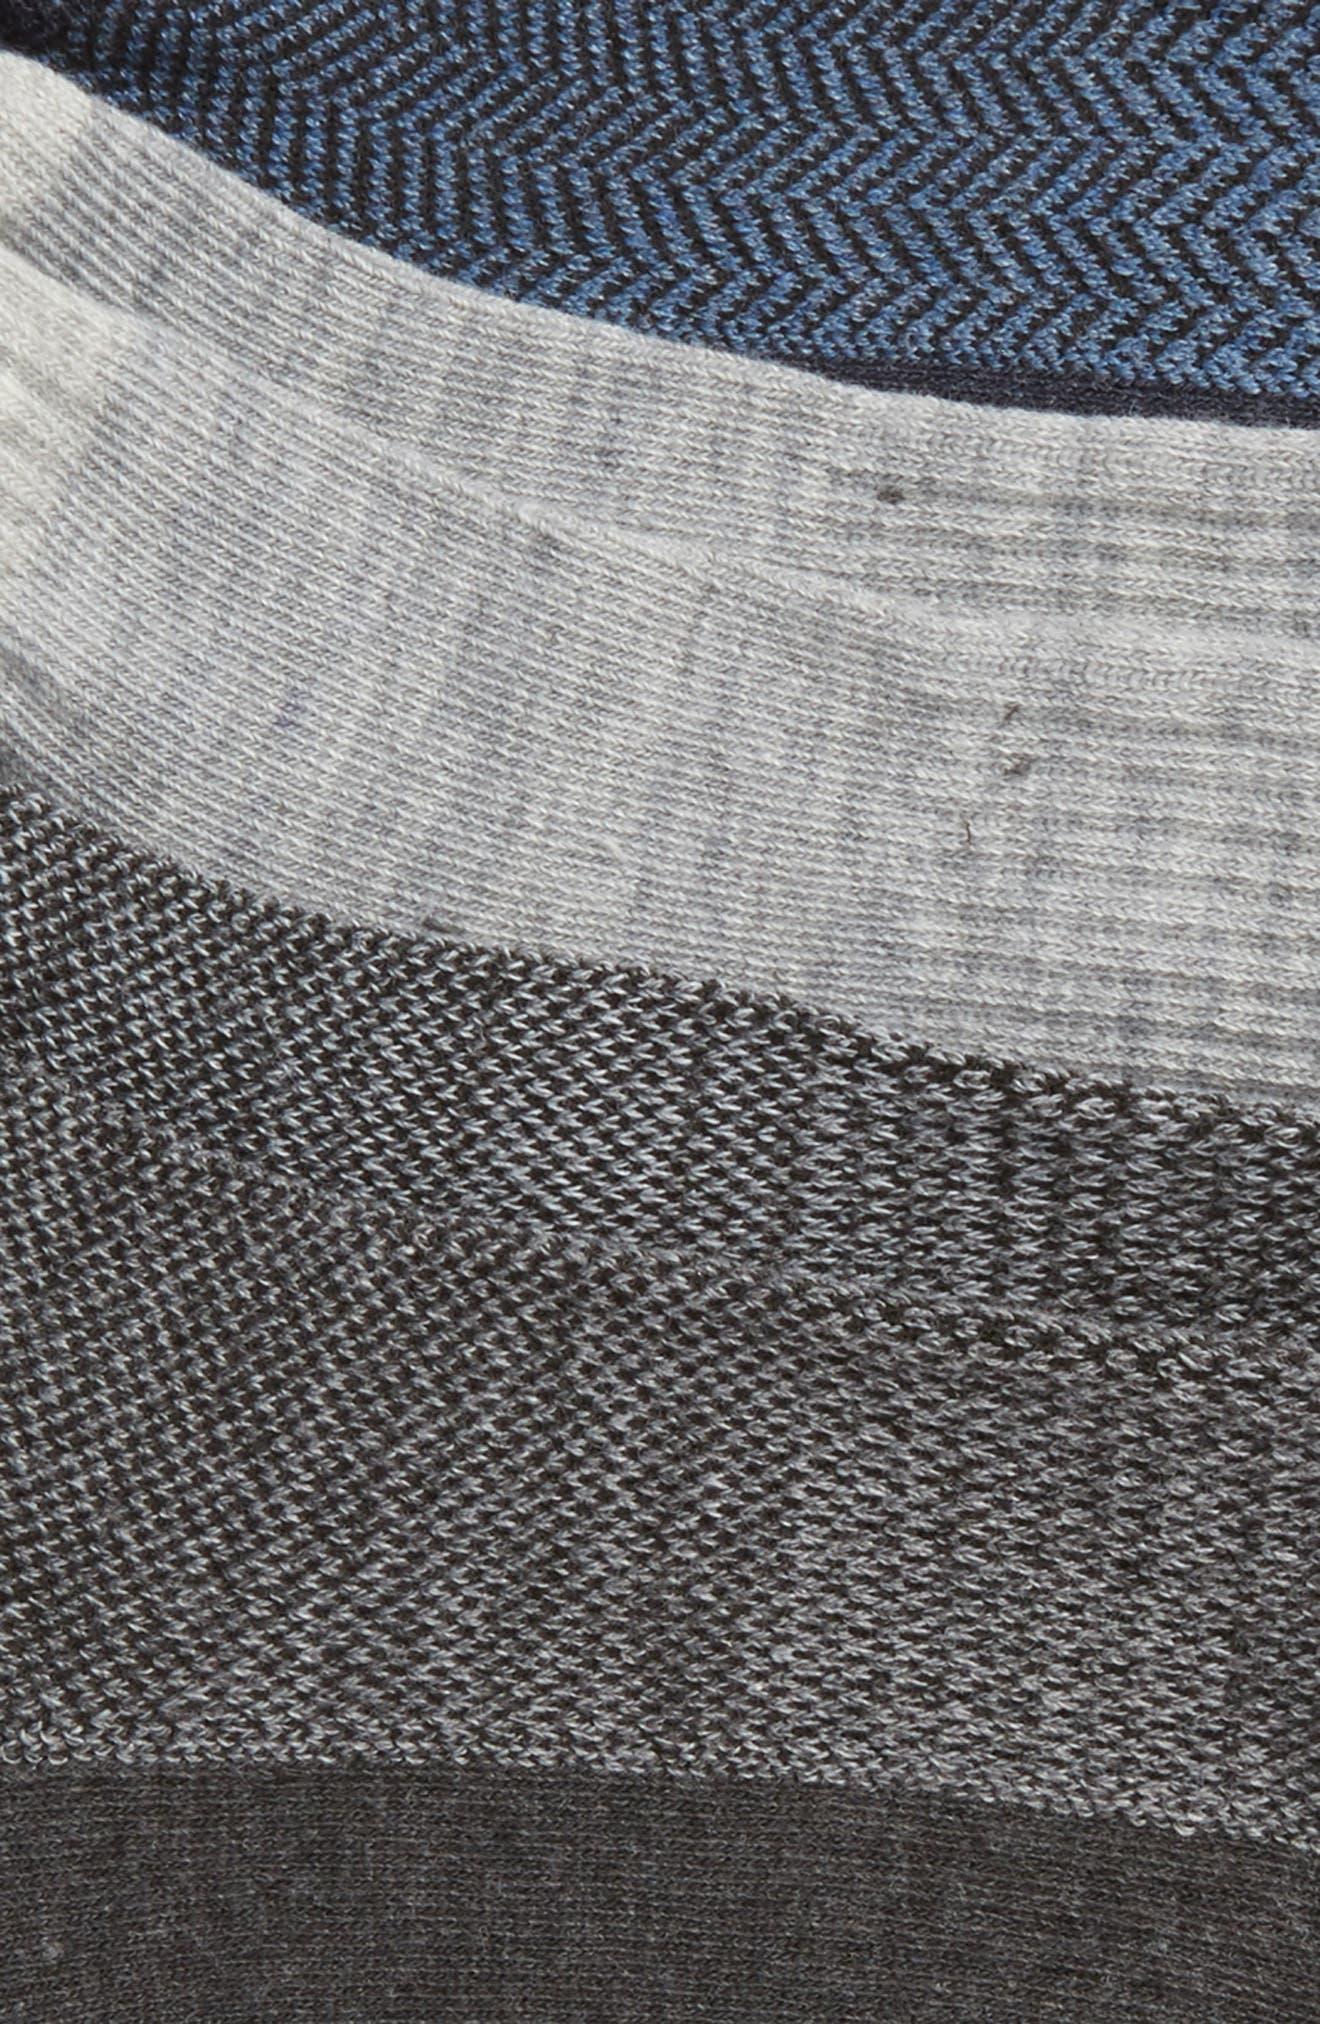 POLO RALPH LAUREN,                             3-Pack Low Cut Socks,                             Alternate thumbnail 2, color,                             029